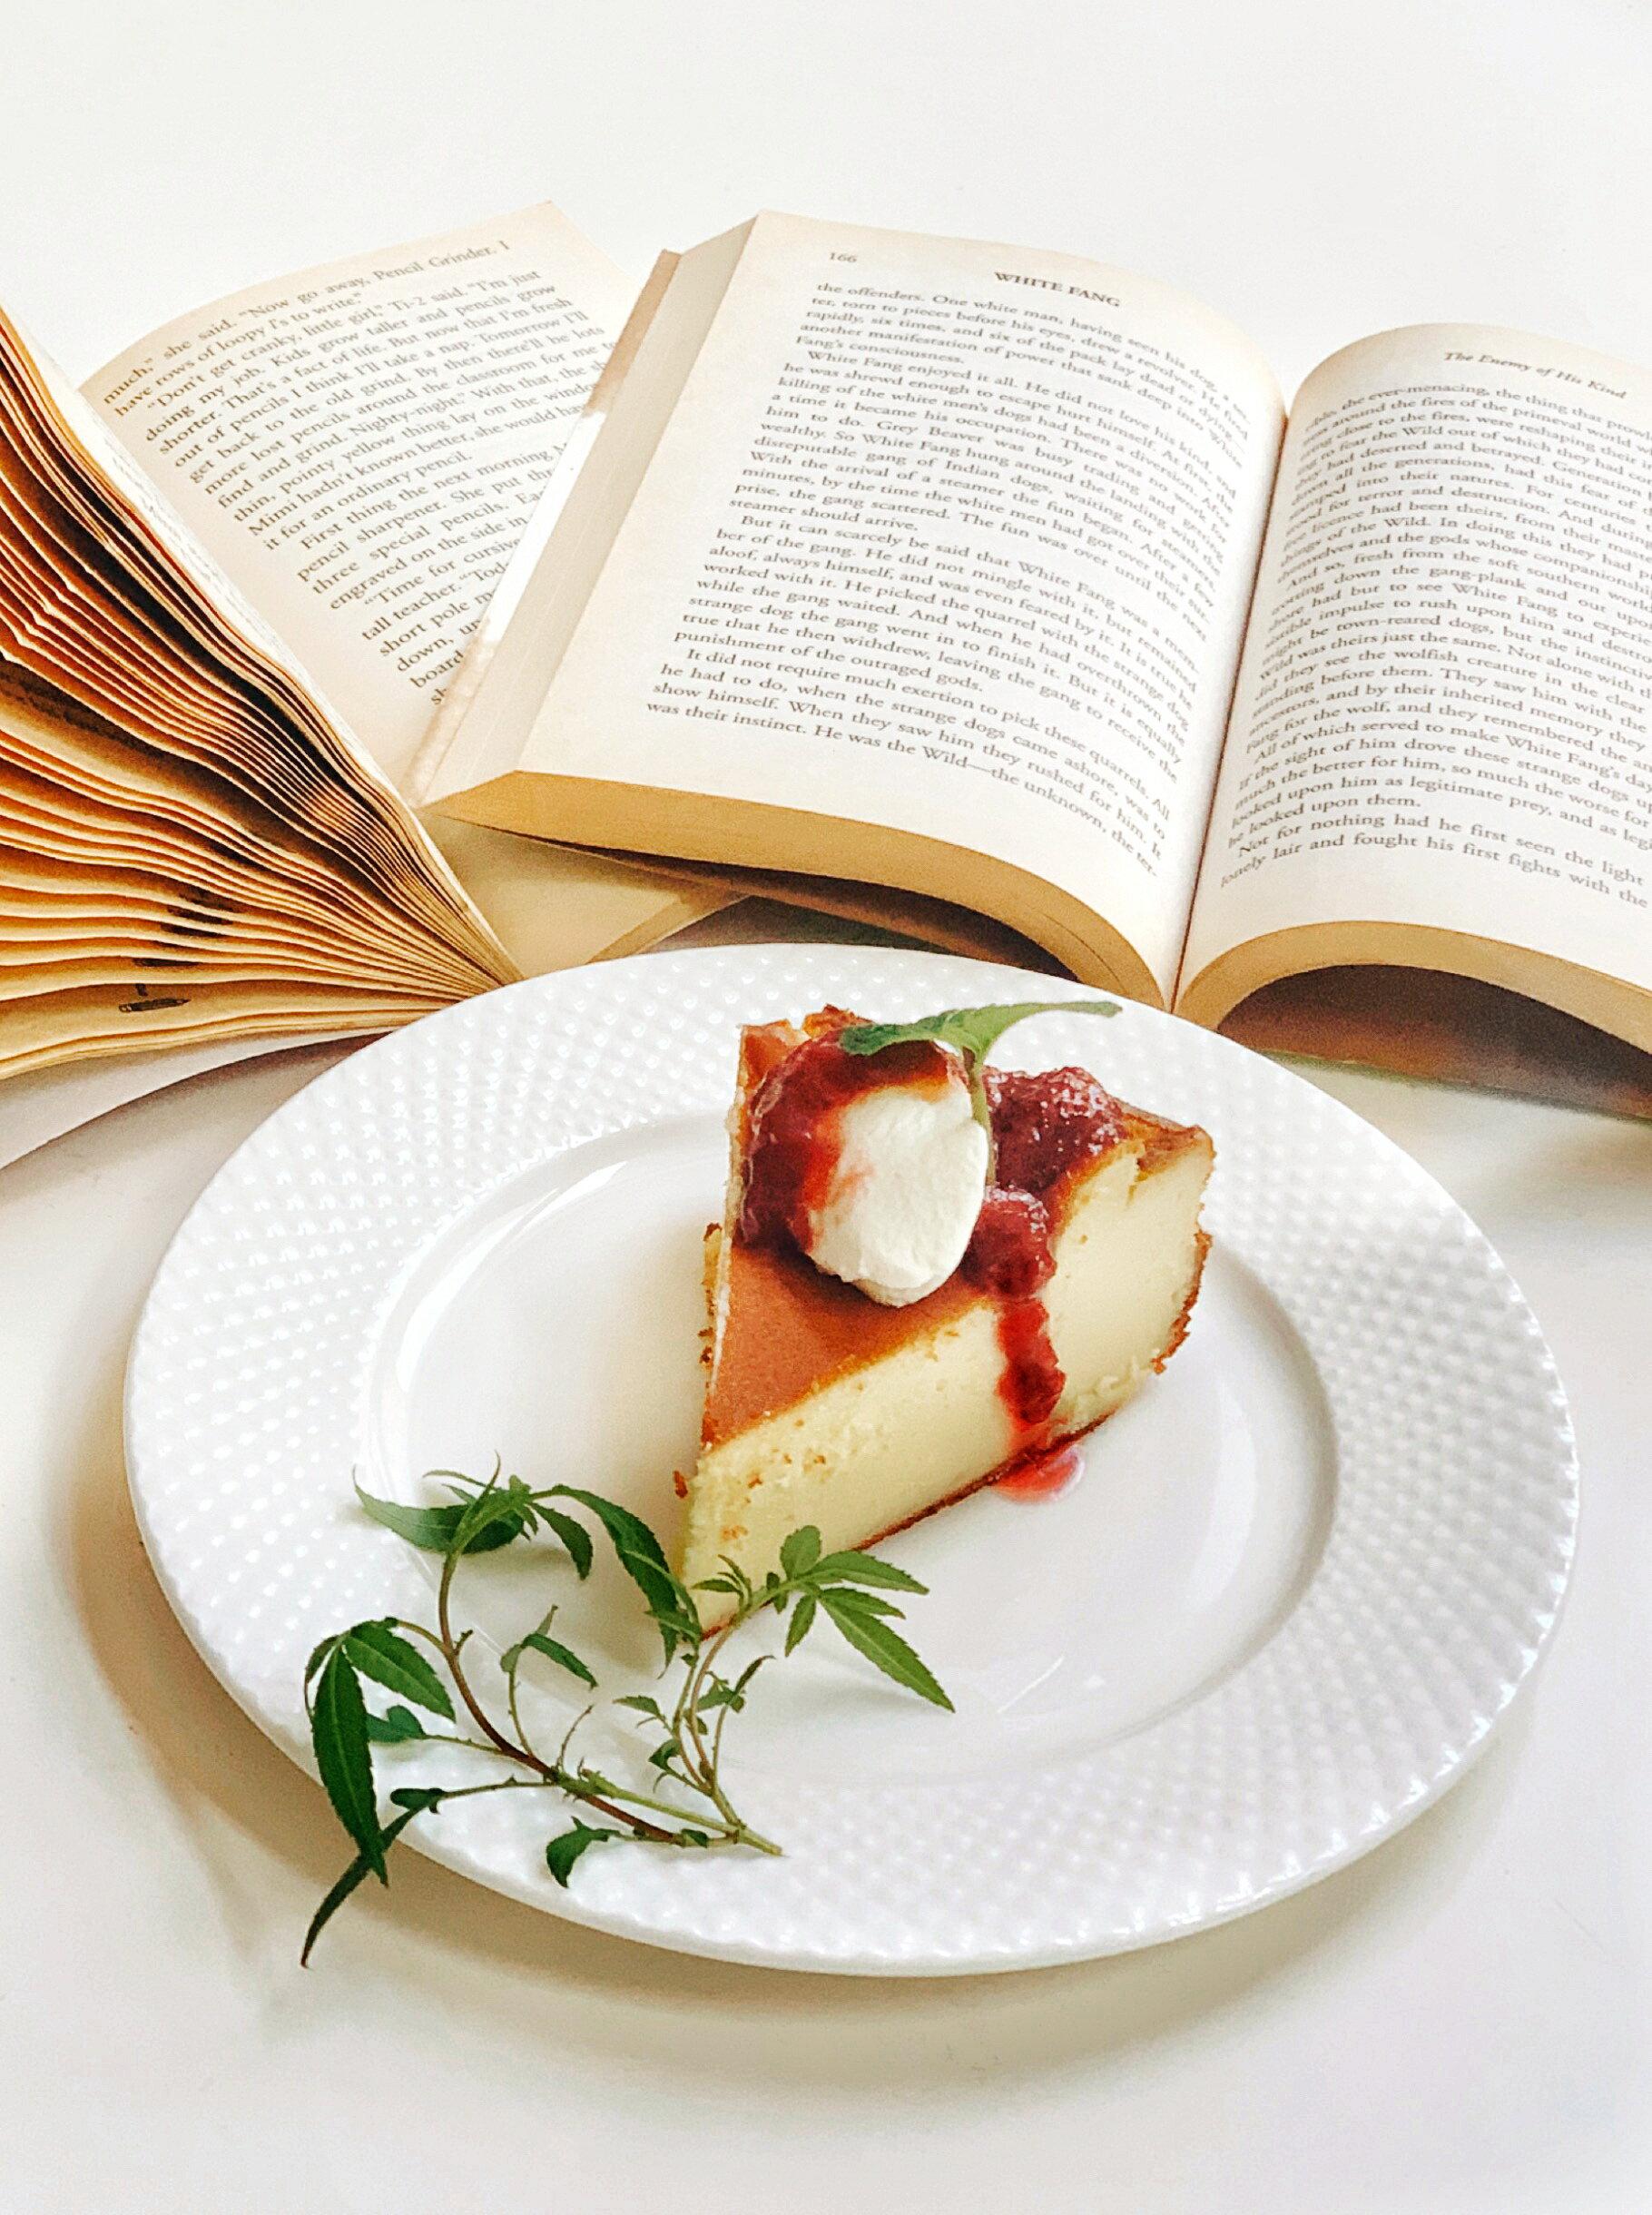 生酮巴斯克焦糖起司蛋糕 Ketogenic Basque Burnt Cheesecake